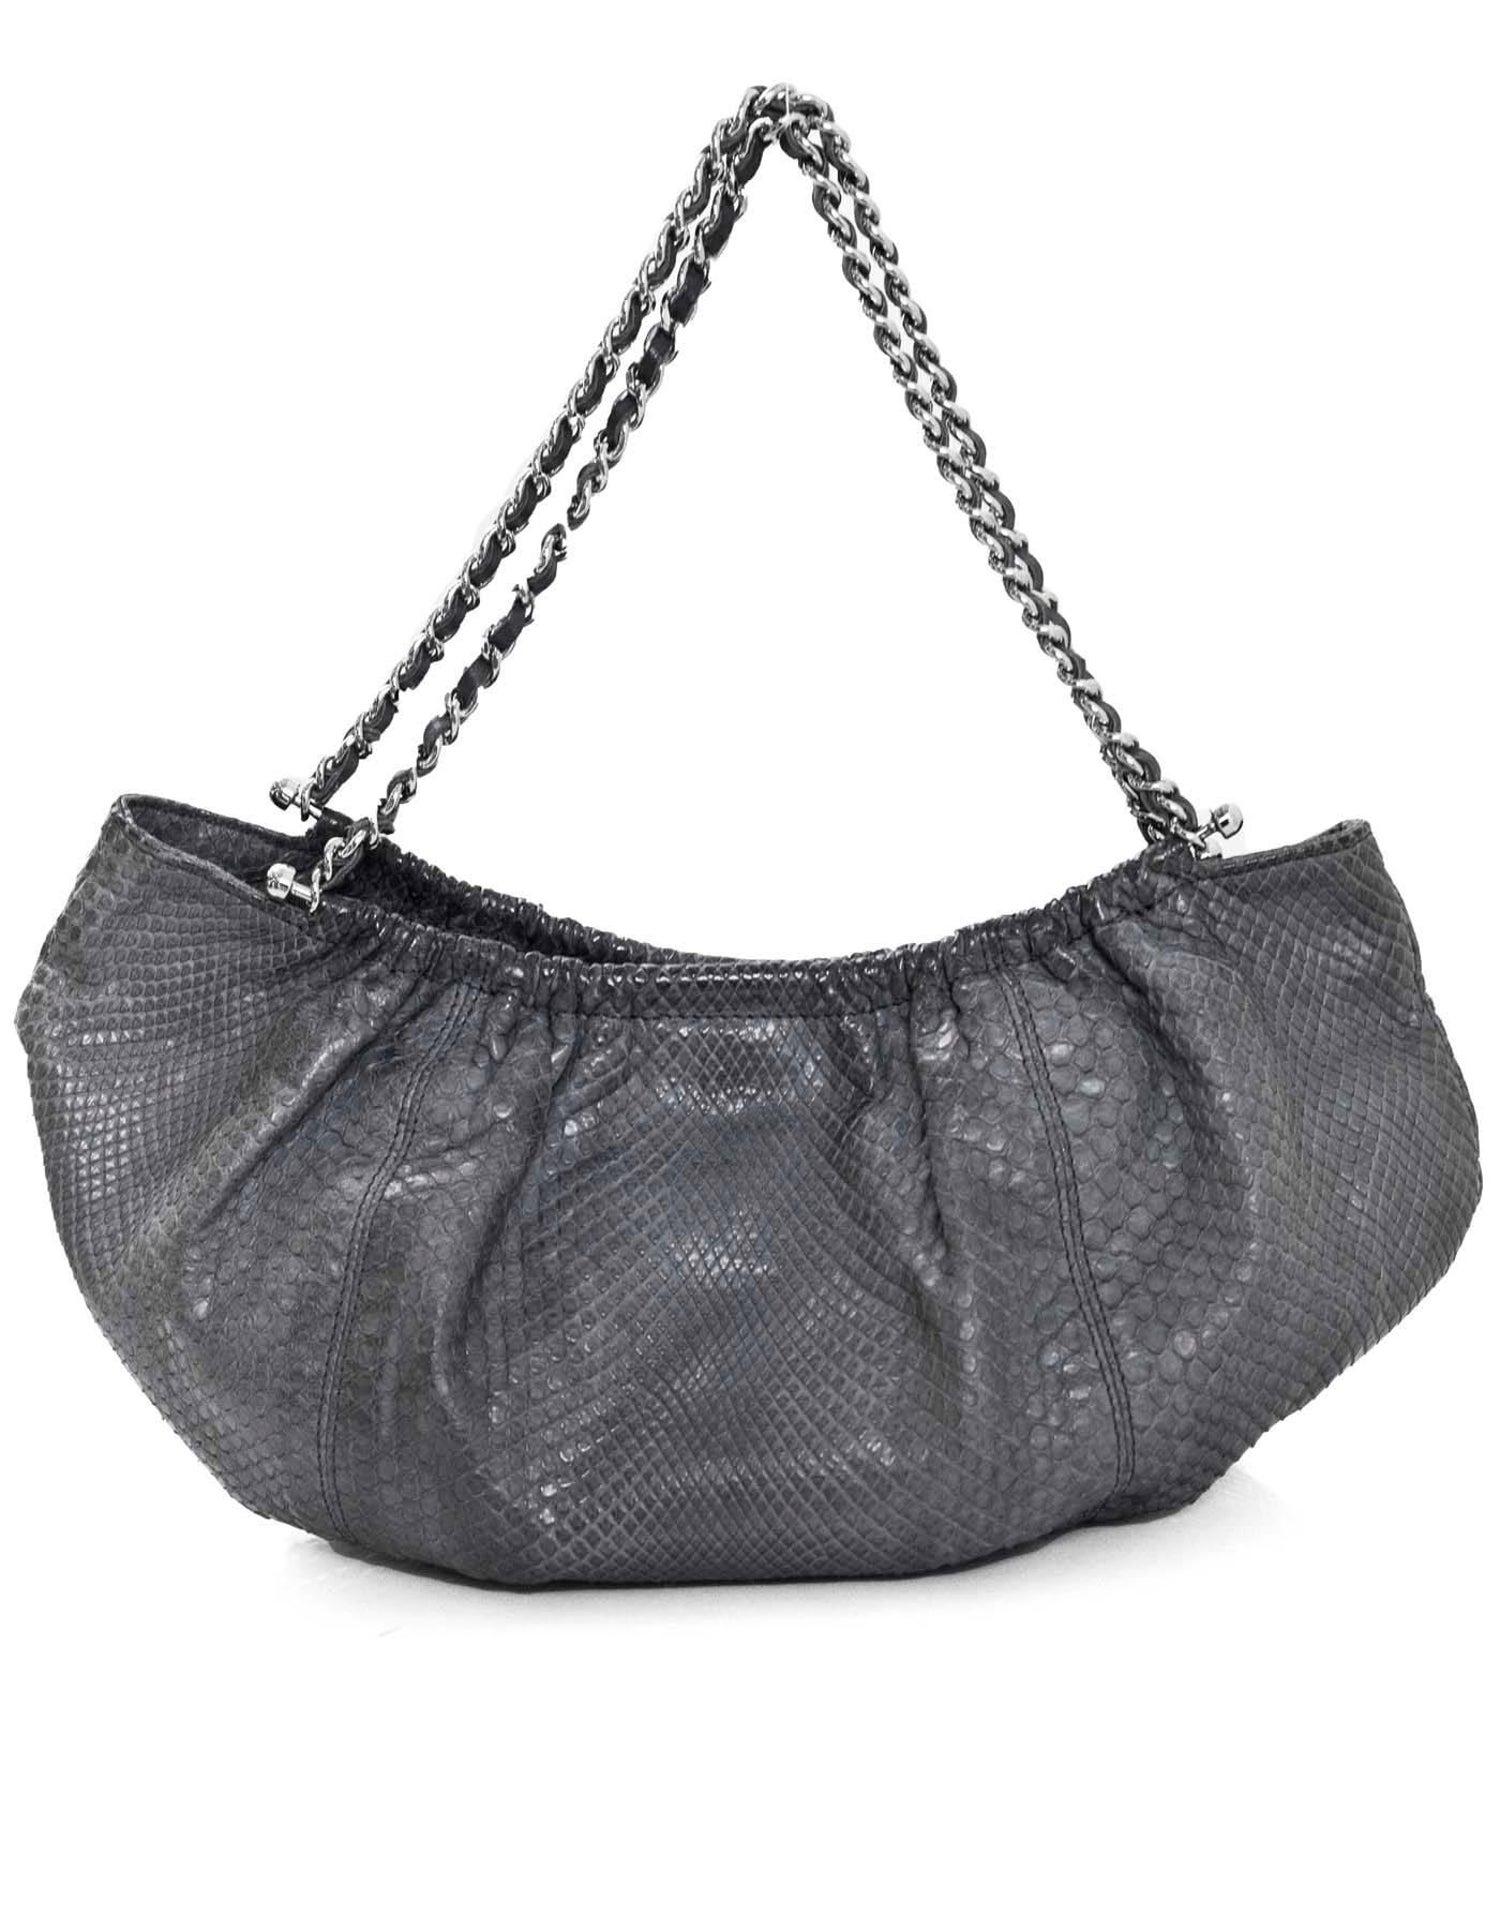 2b82b8aba771 Chanel Grey Python Small Shoulder Bag with CC For Sale at 1stdibs